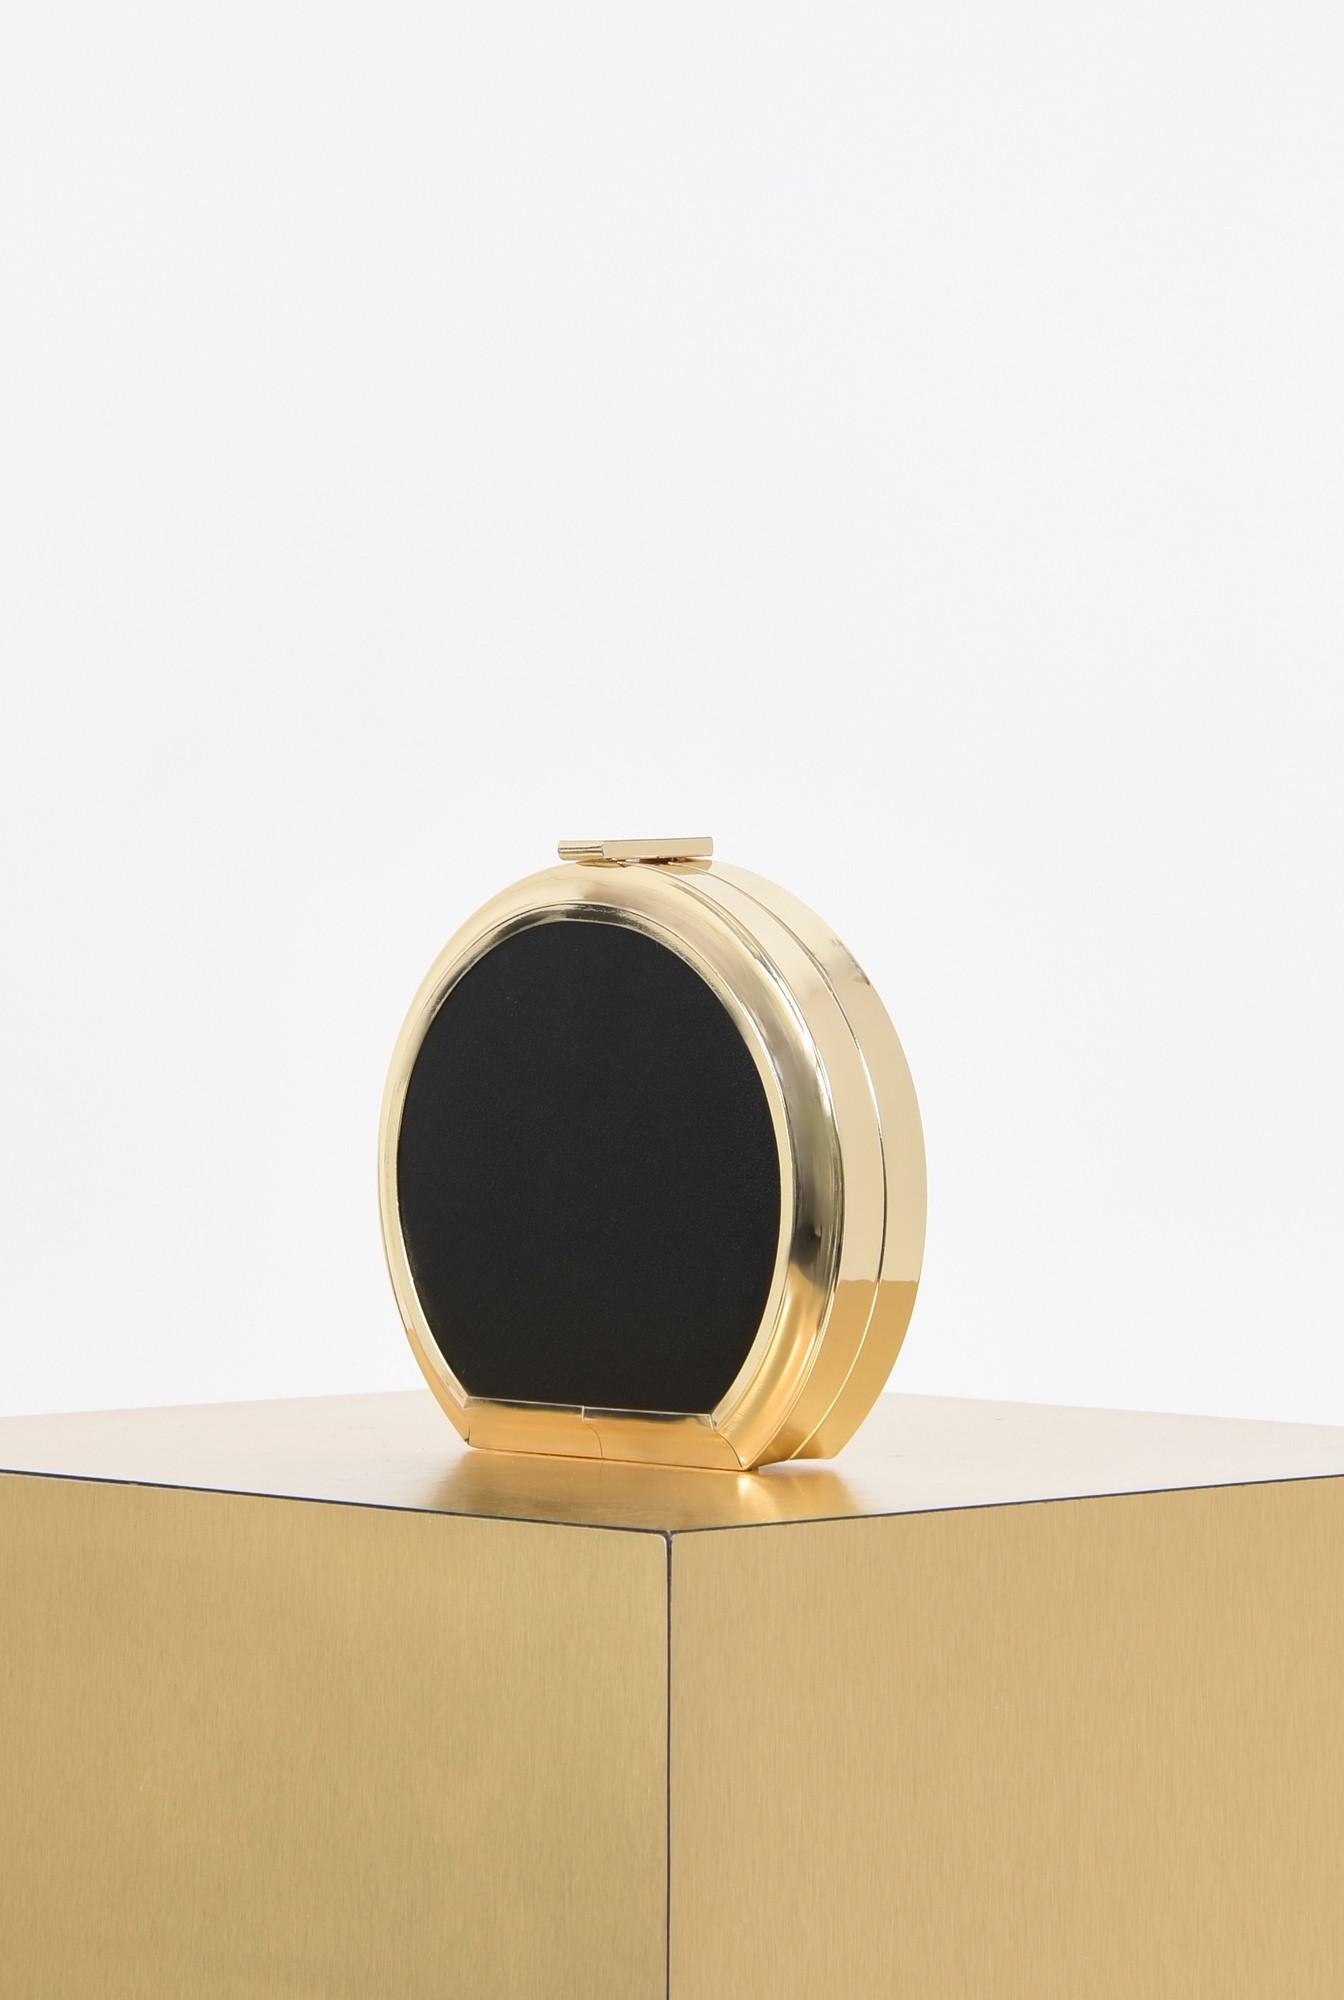 1 - plic elegant, negru, caseta, ciucure, lant auriu